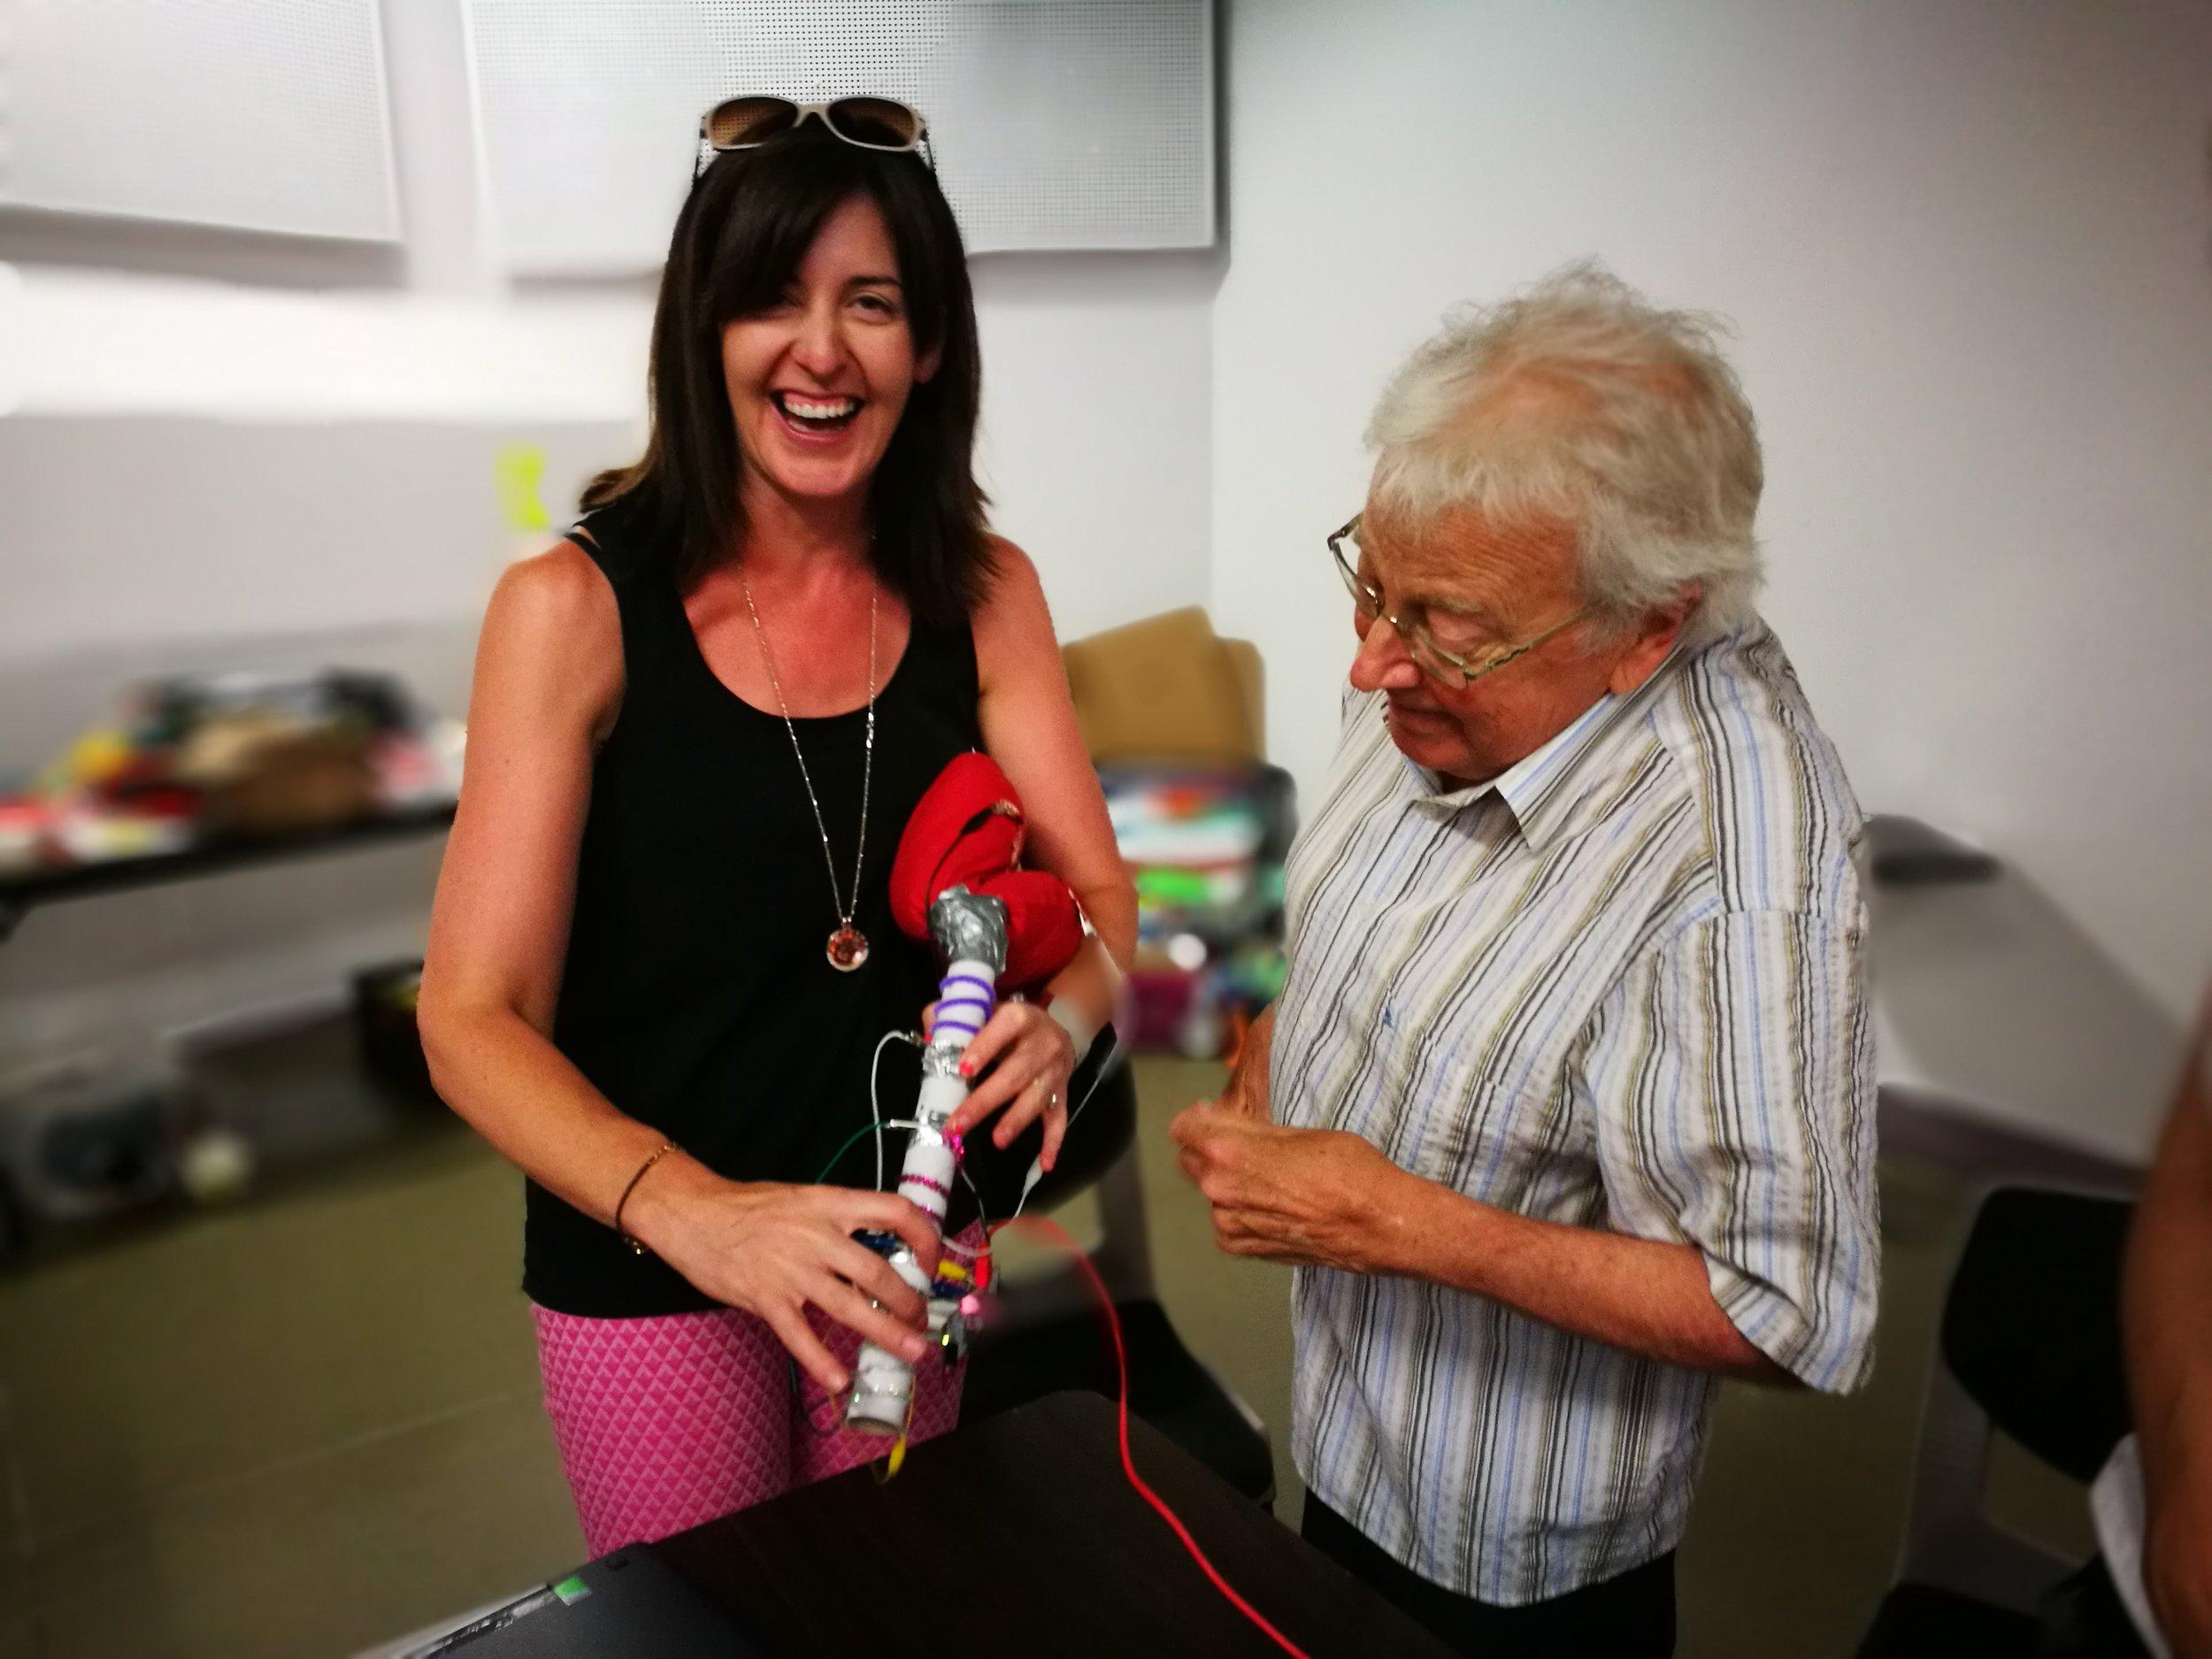 Makey Makey Uillinn Piper with smiling friend.jpg